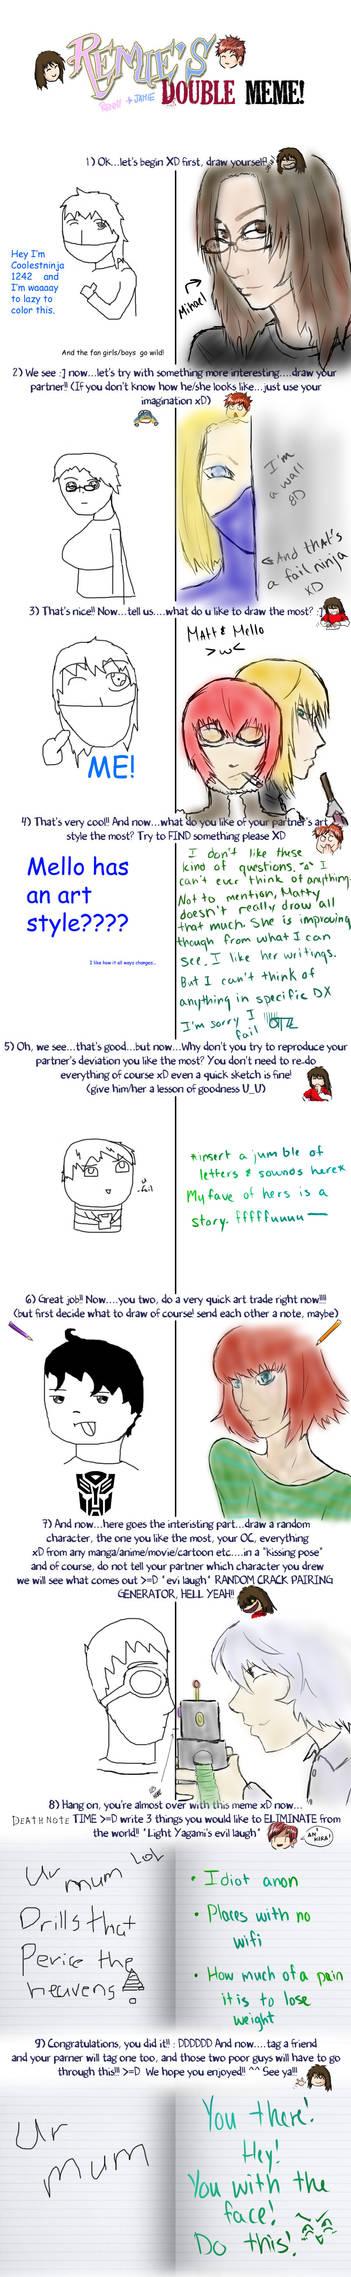 Double Meme with Ninja Coco by CoolestNinja1242 on DeviantArt